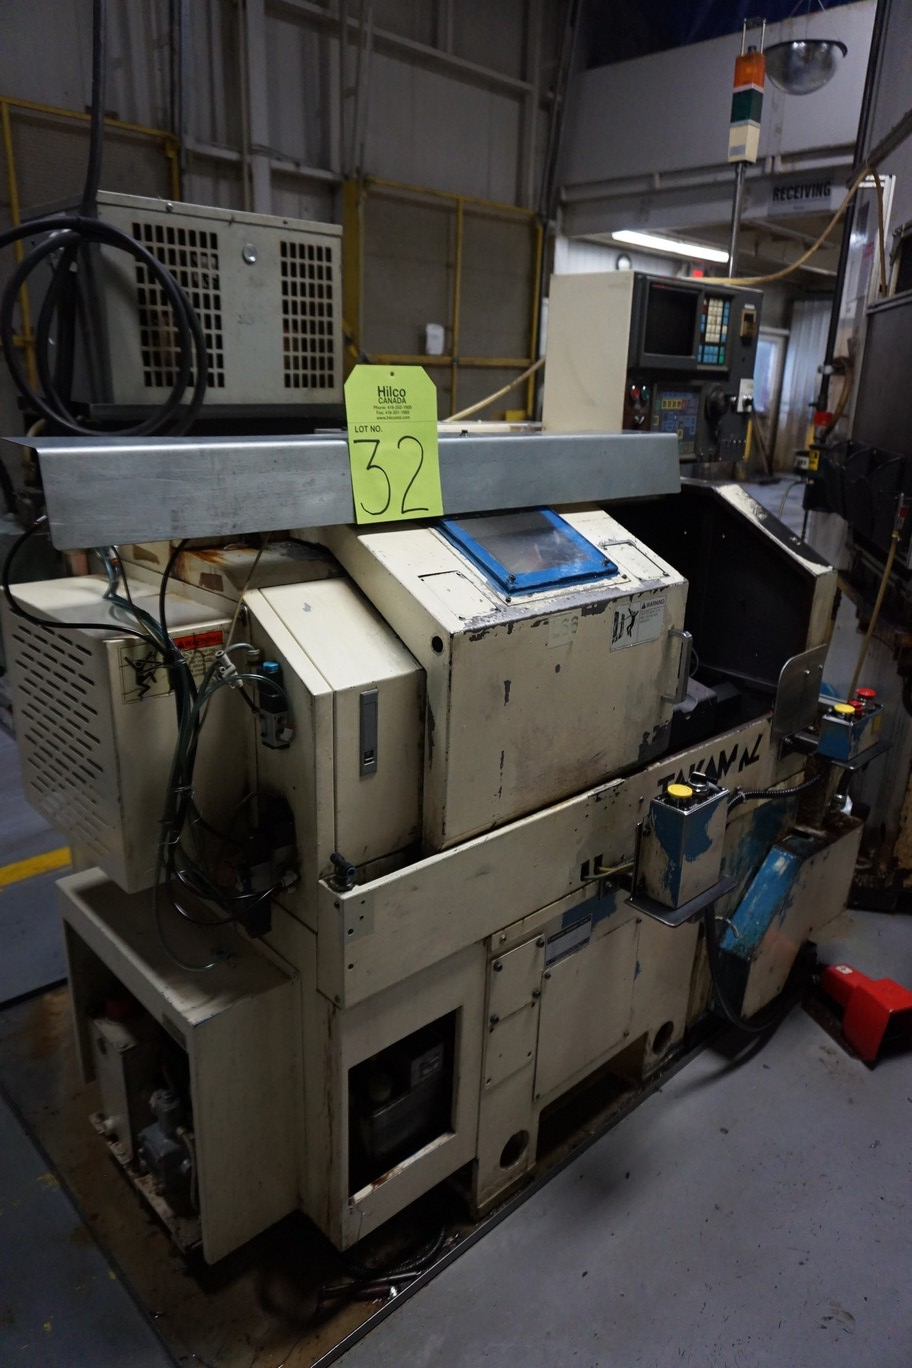 Takamatsu Model MT CNC Lathe 200/220V c/w Transformer (L66) - Image 2 of 7